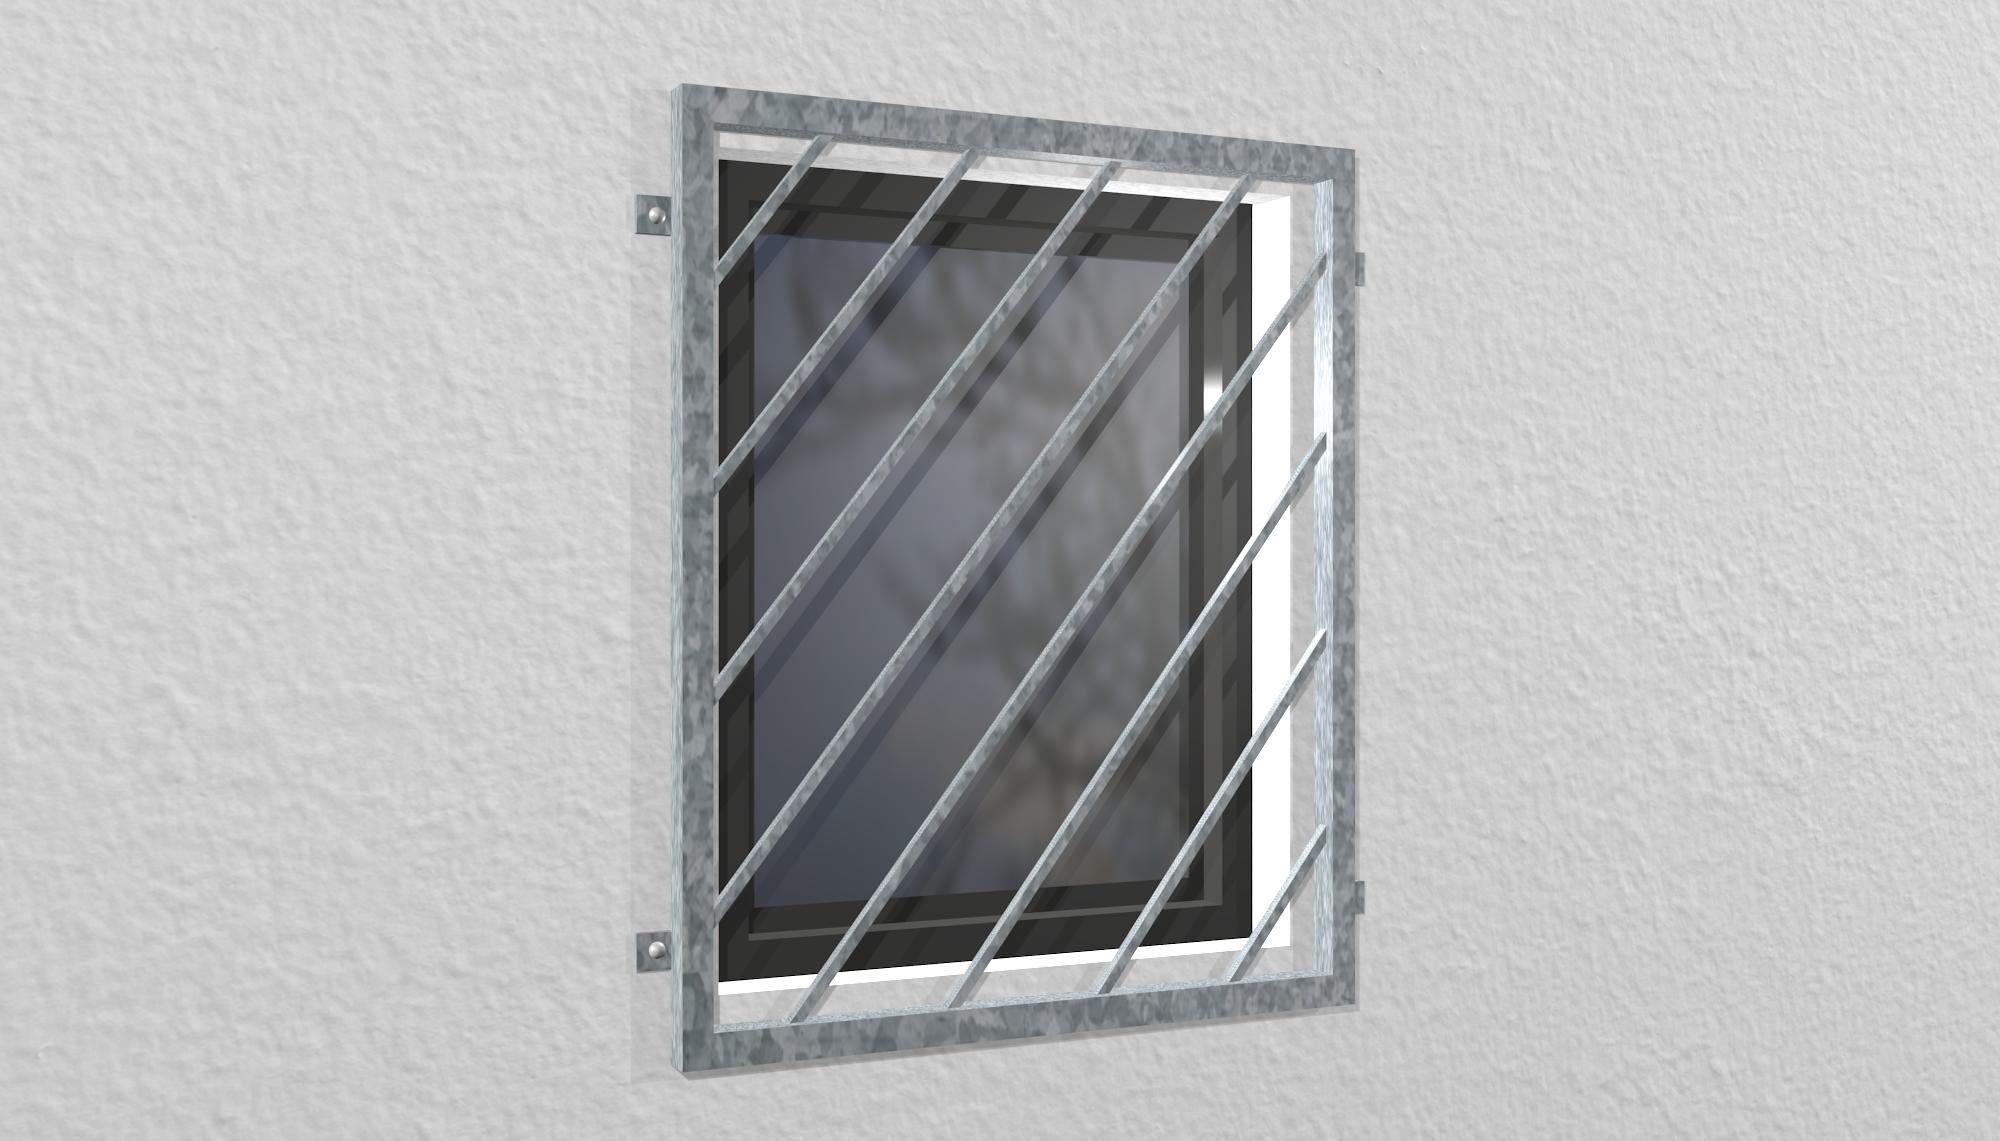 Fenstergitter verzinkt Diagonalstab 1